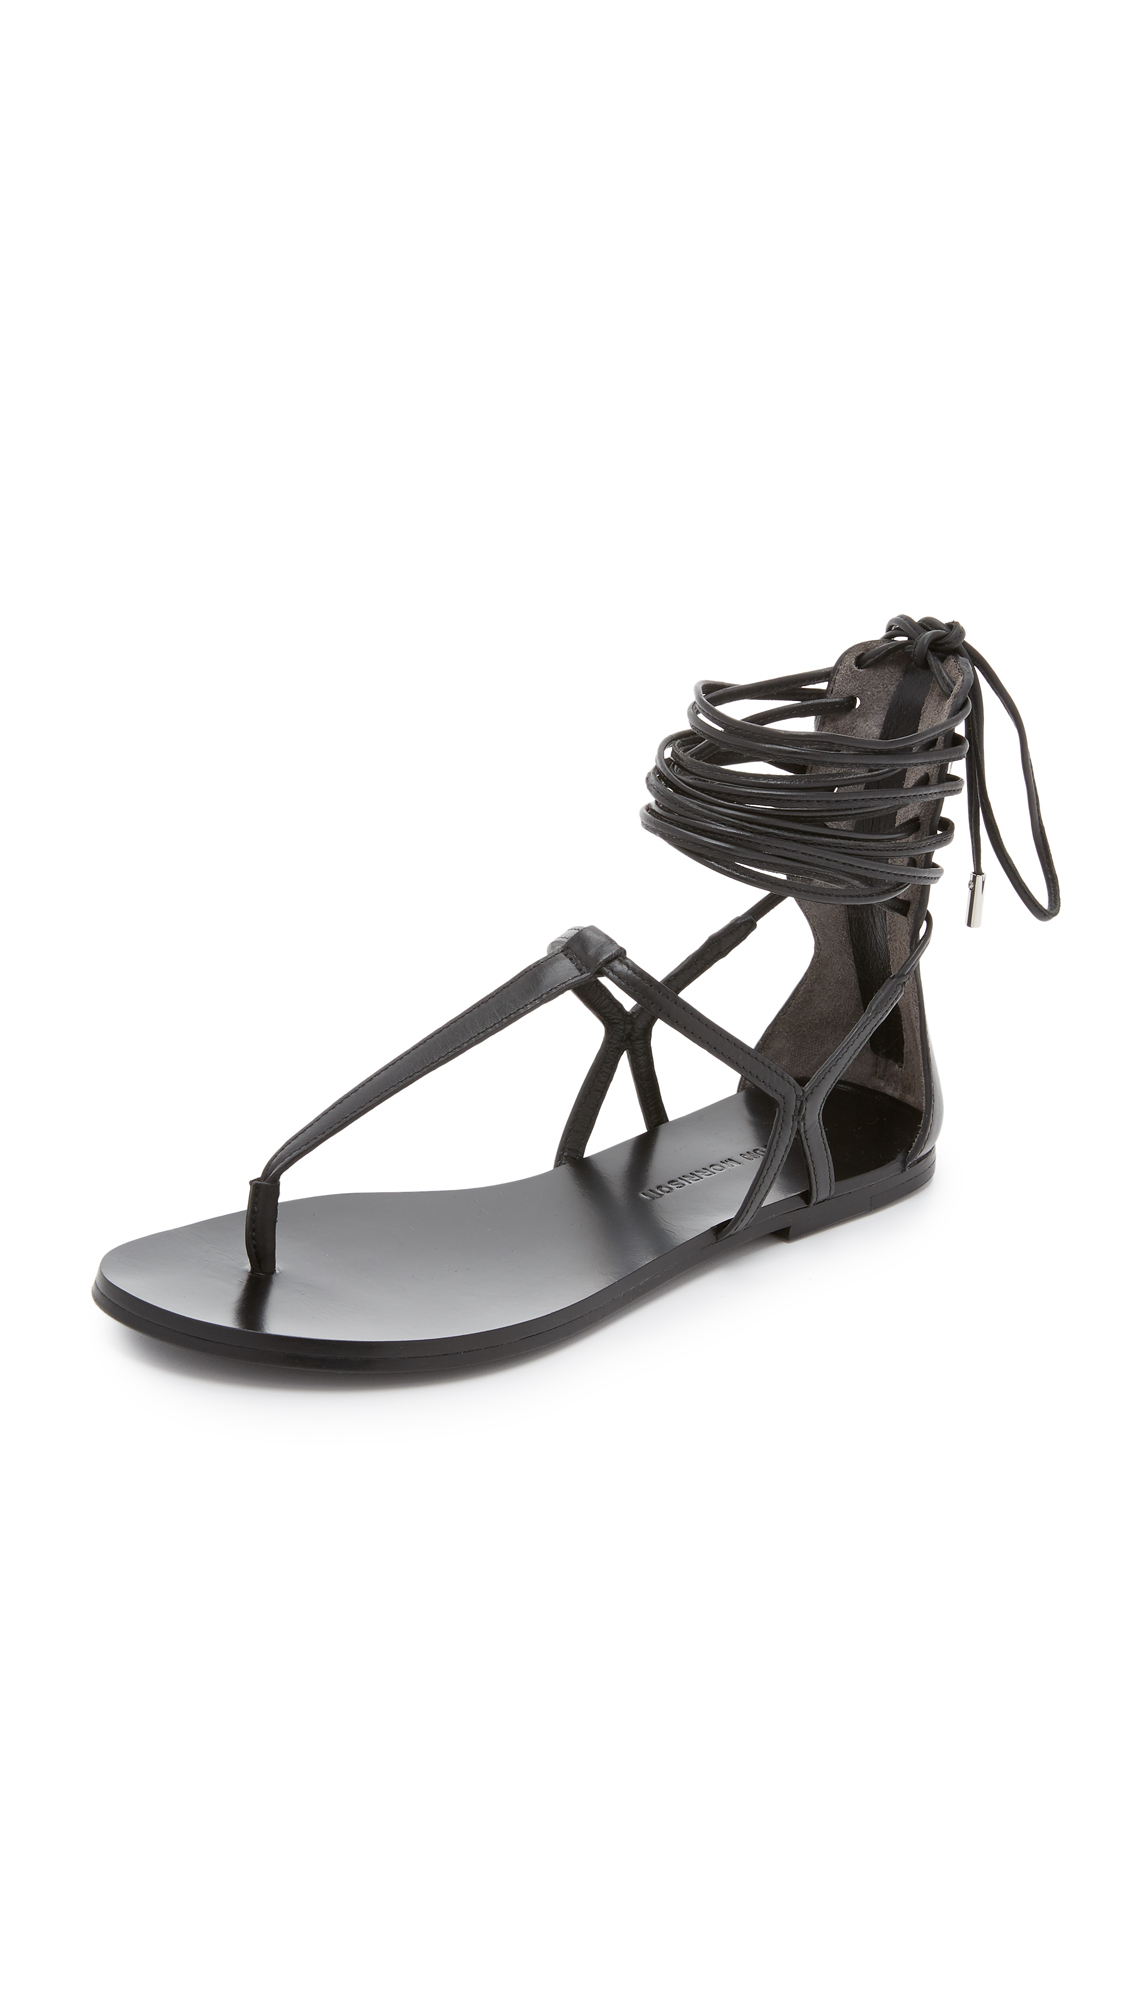 Lyst Sigerson Morrison Braze Thong Sandals In Black